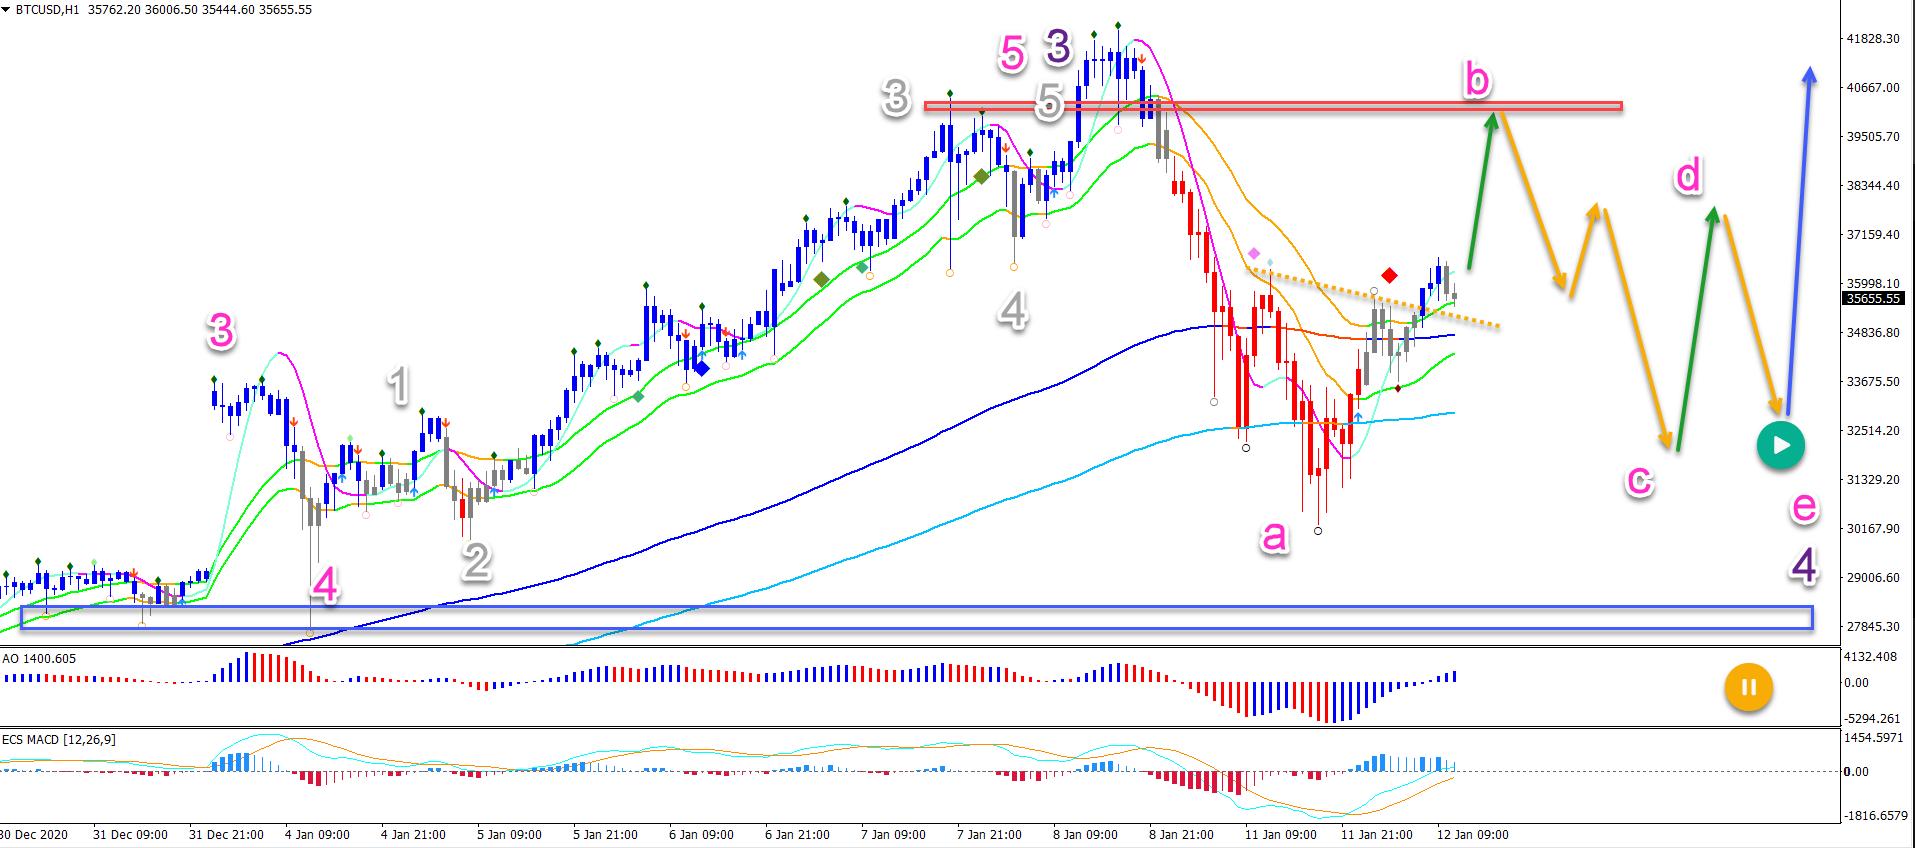 BTC/USD 12.01.2021 1 hour chart